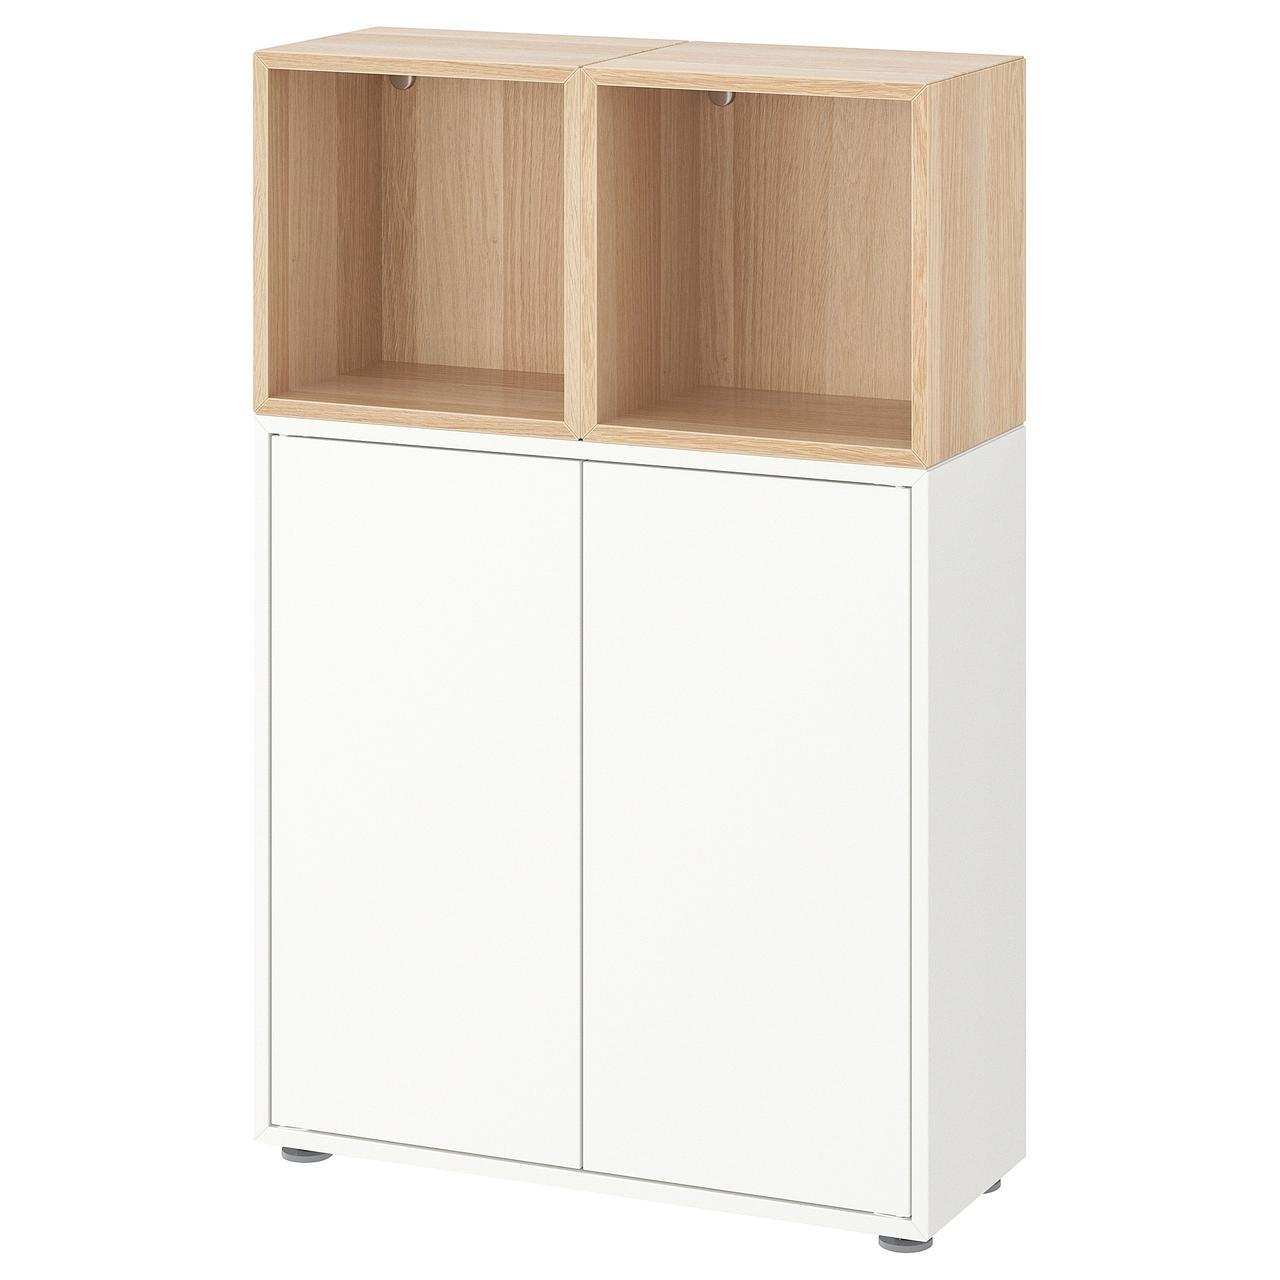 ✅ EKET Комбинация шкафов на ножках, белый, дуб bejcowany на бело